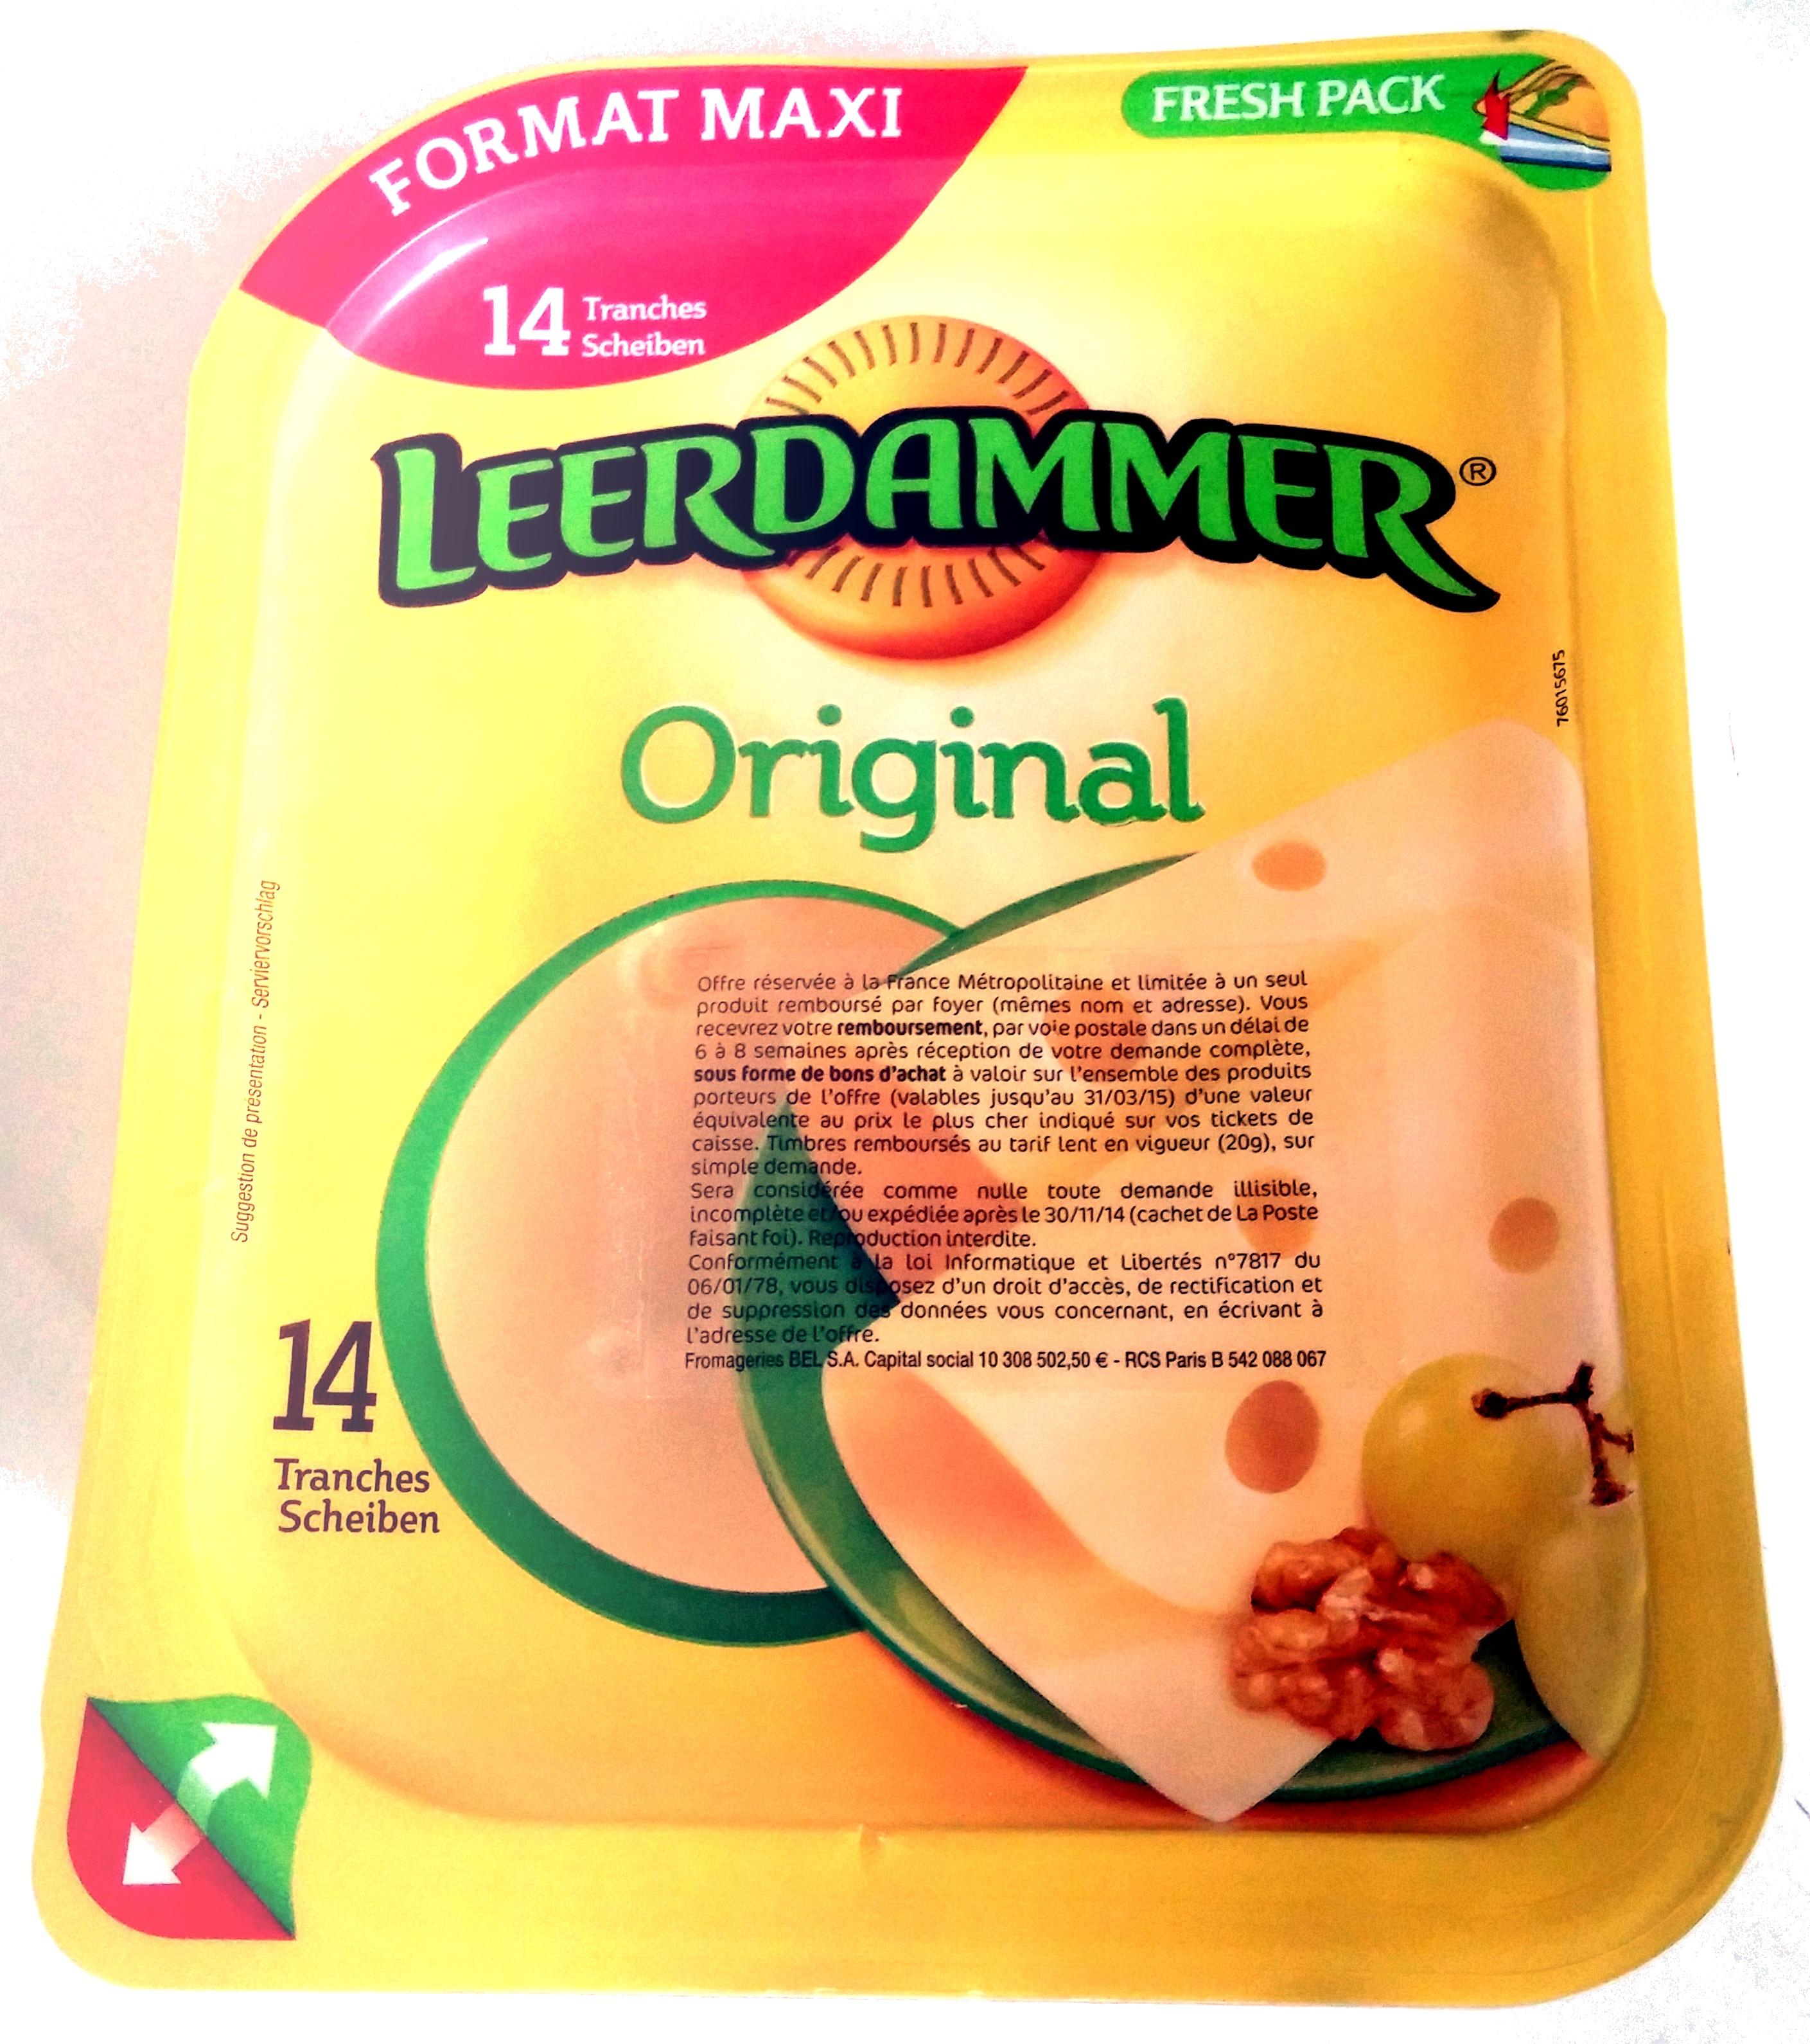 Leerdammer ® Original (27,5% MG) - 14 tranches - 350 g - Produkt - fr